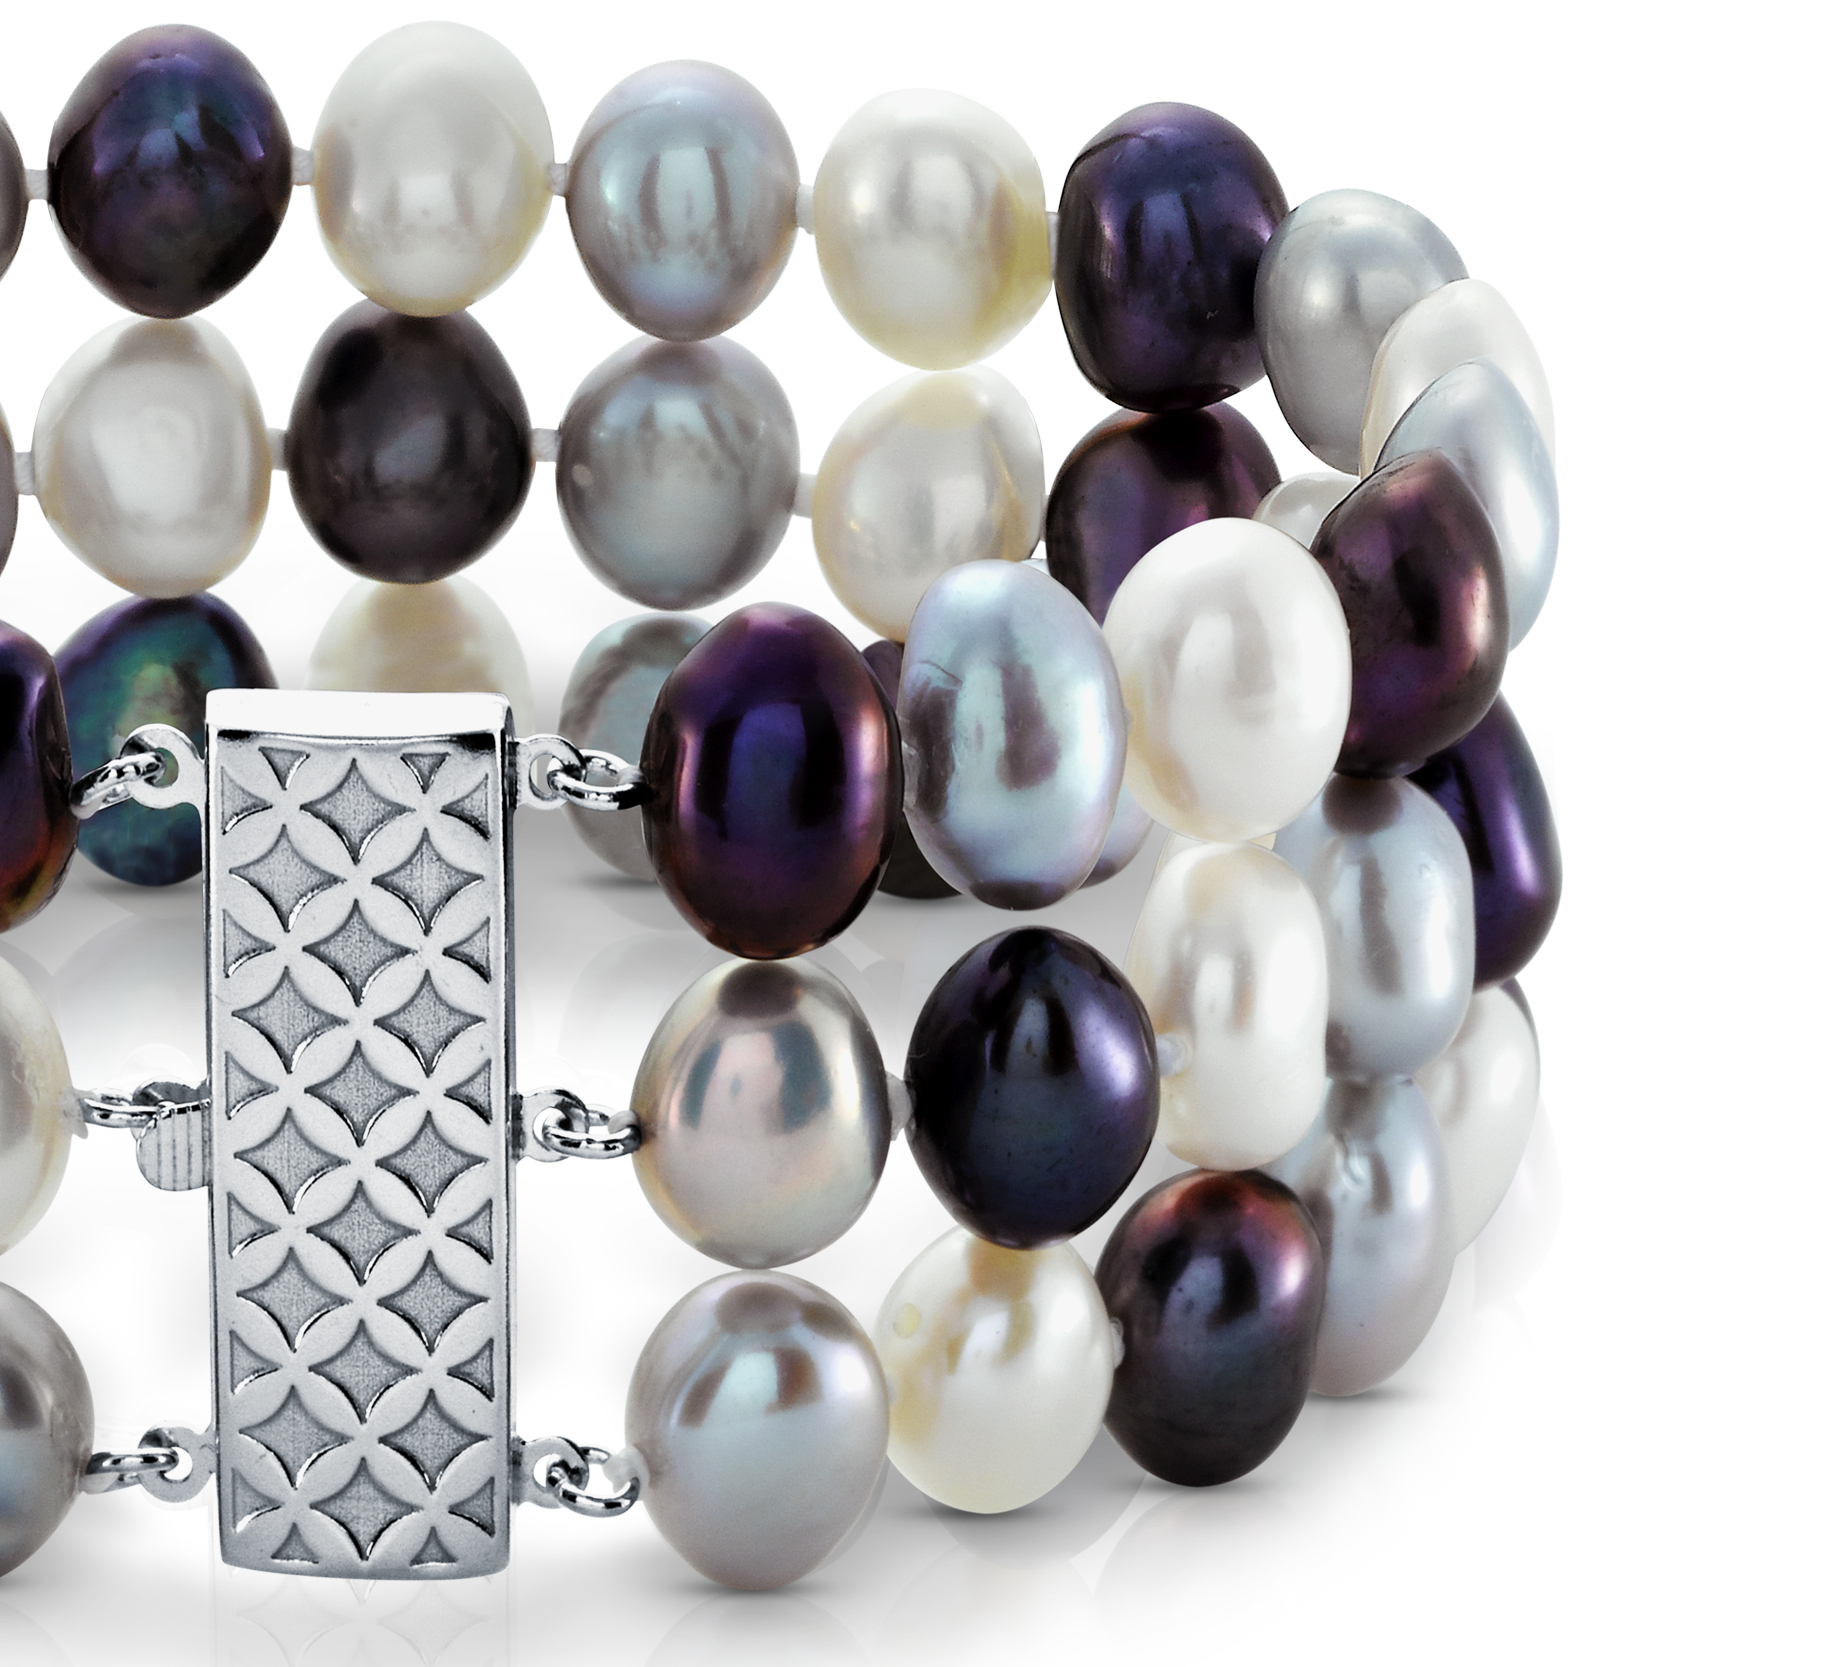 Elegante brazalete de tres vueltas de perlas cultivadas de agua dulce